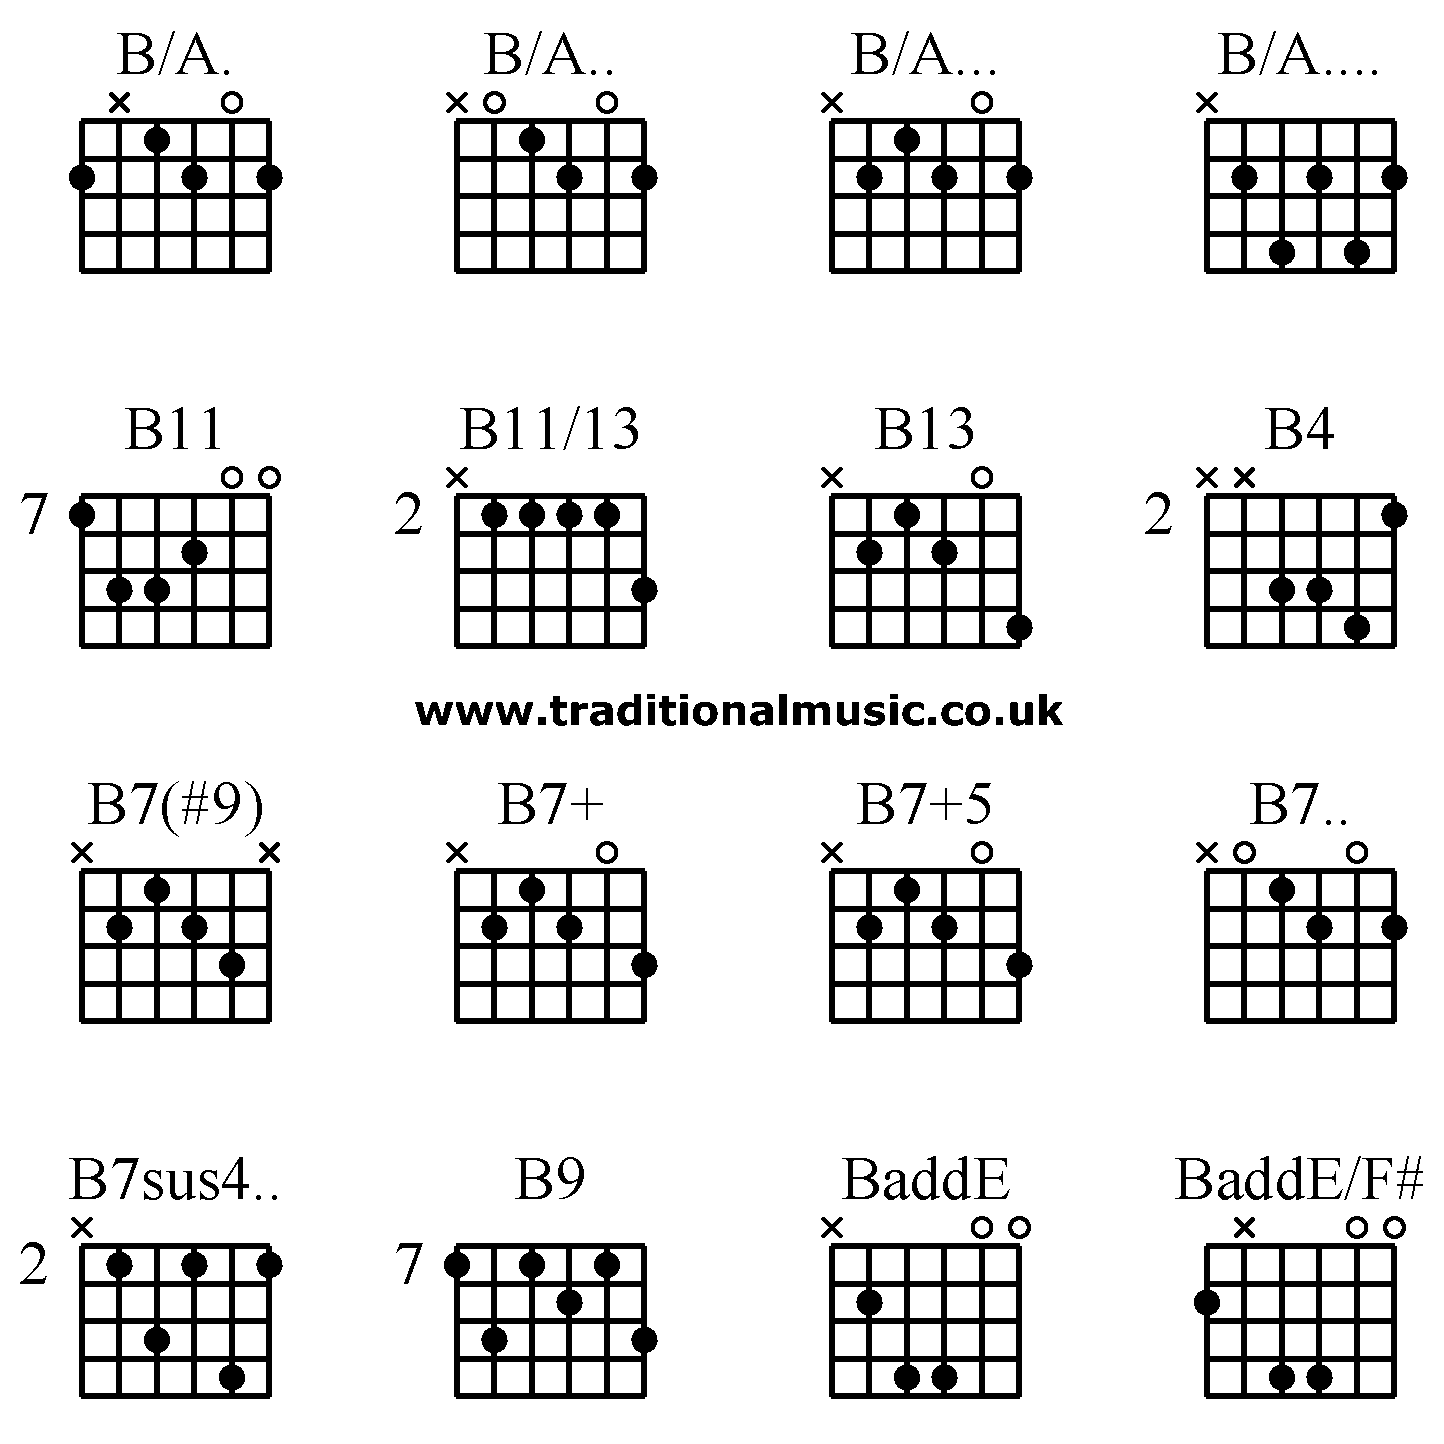 Guitar Chord B Dec 31 10 07 42 Picture Gallery